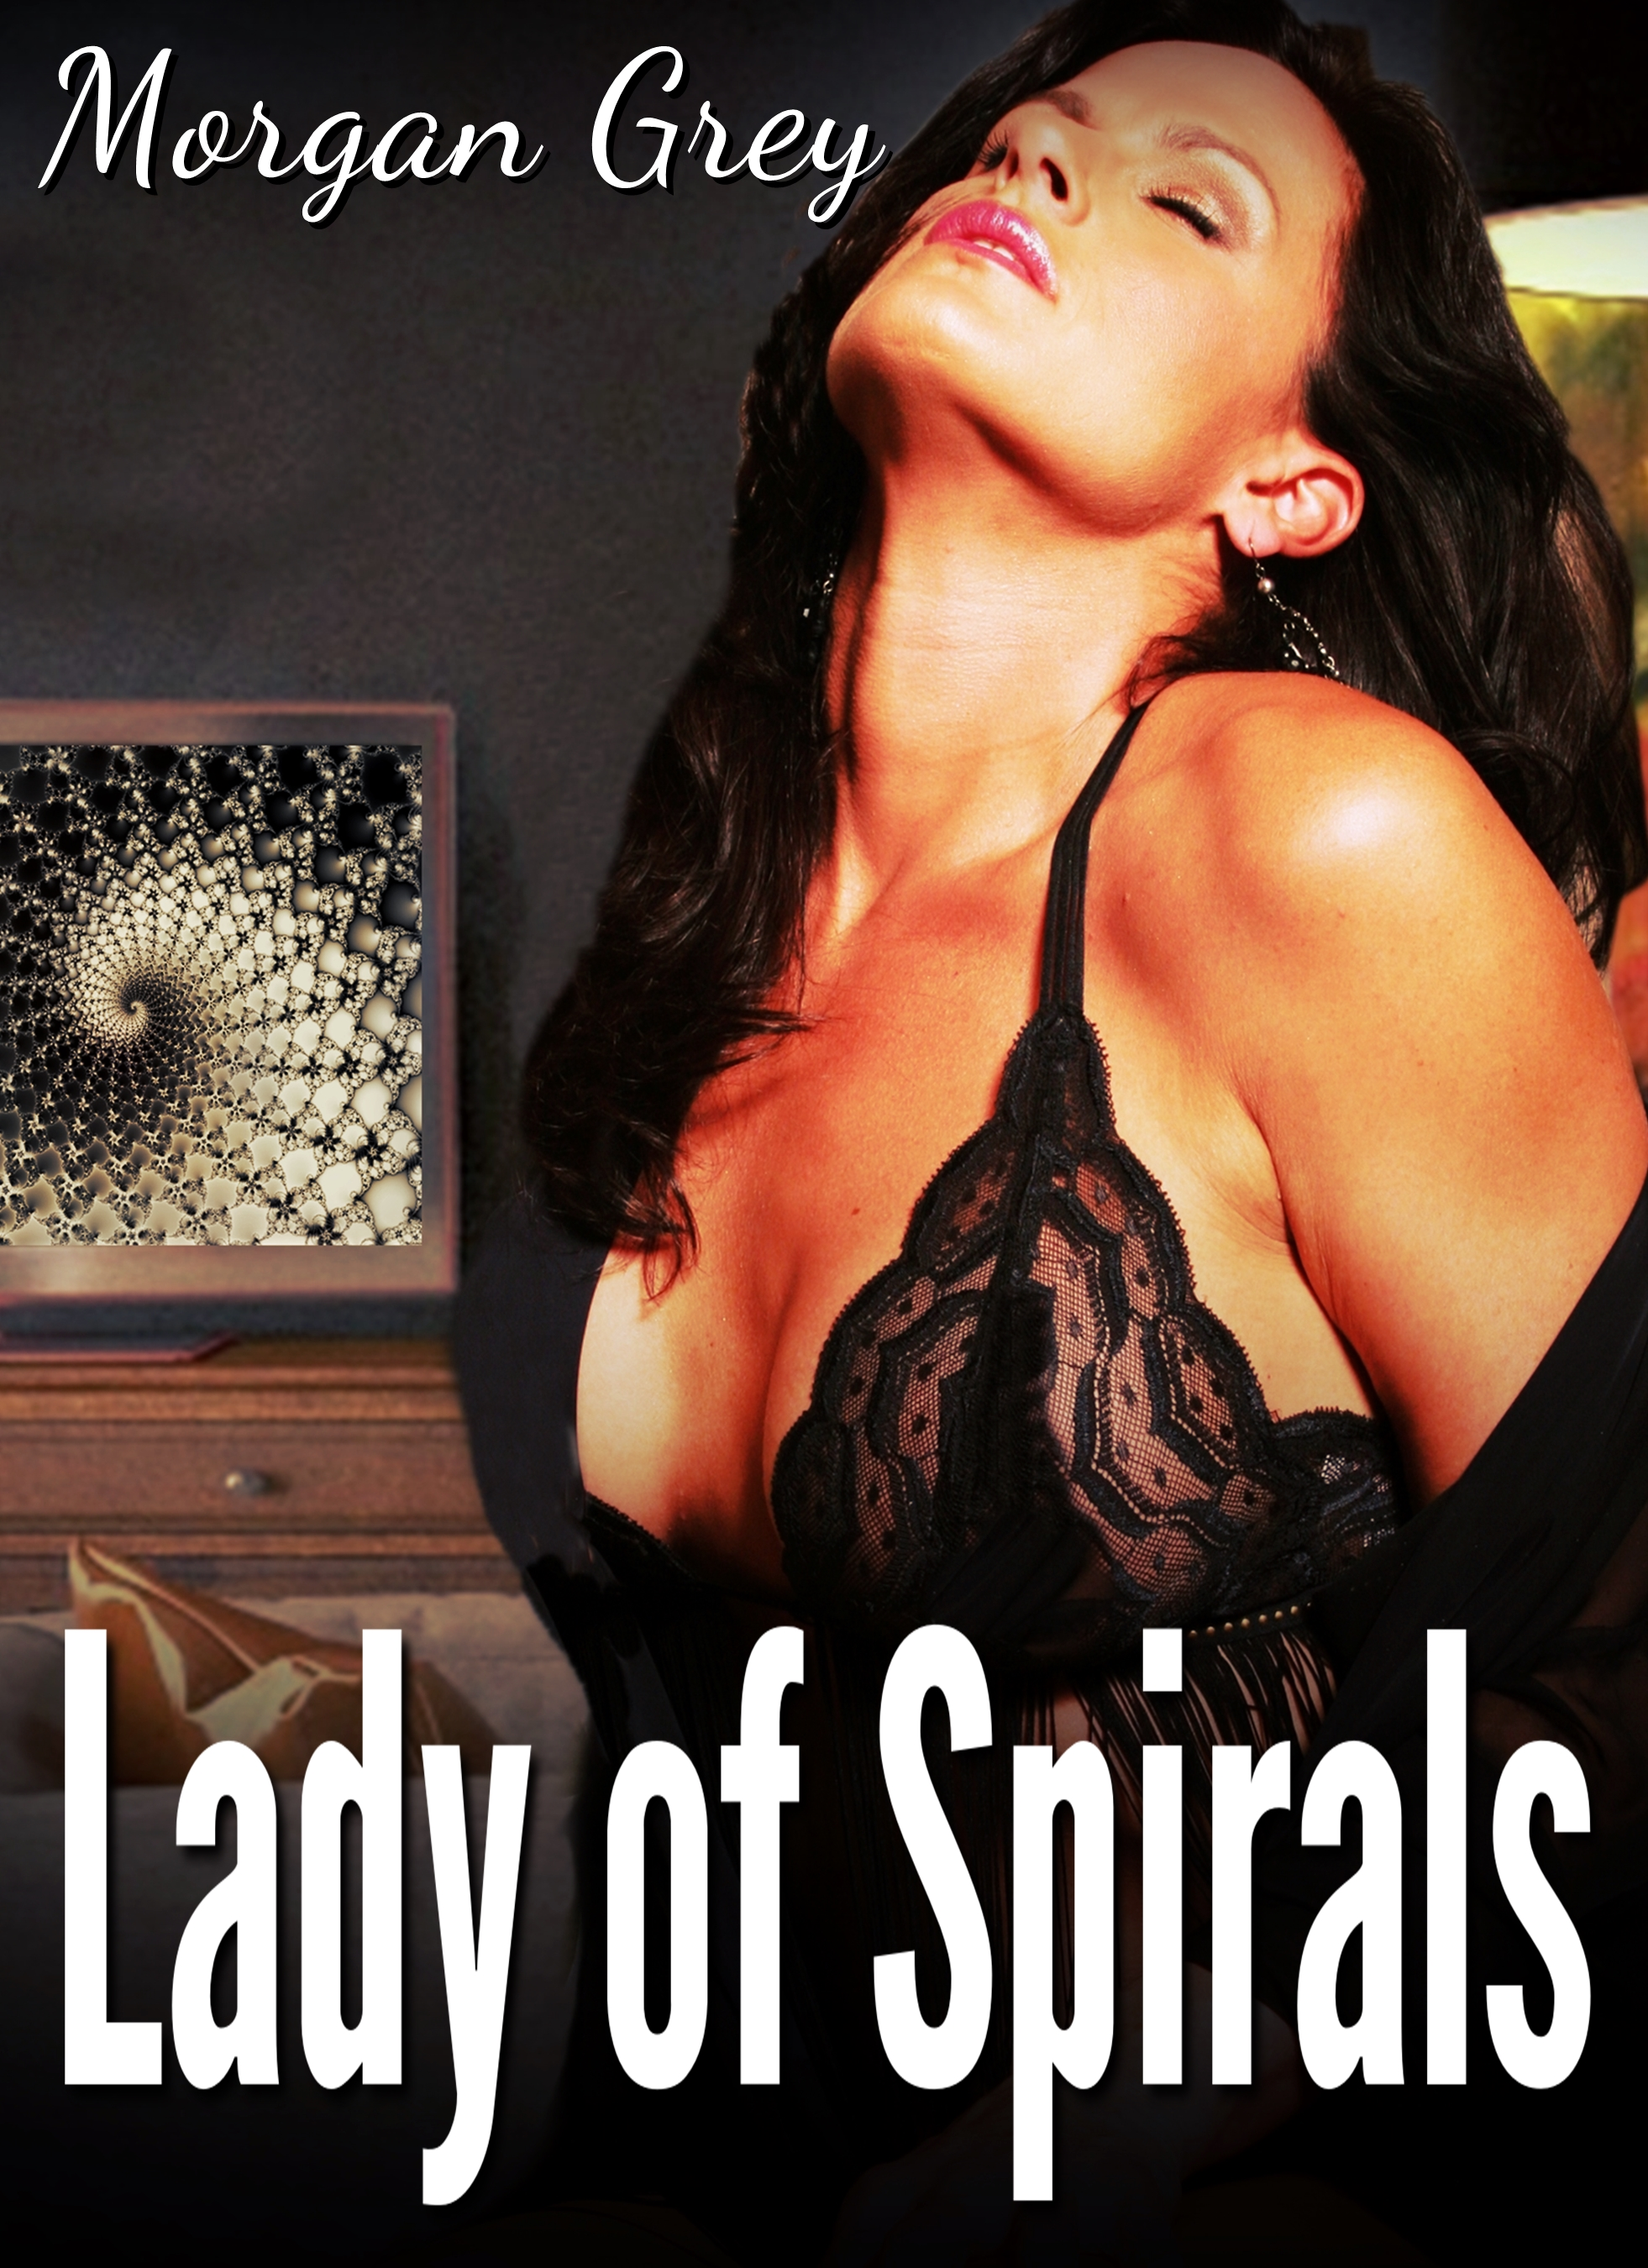 Hypnotized Porn Tube Free Sex Videos Fuck Tube Movies